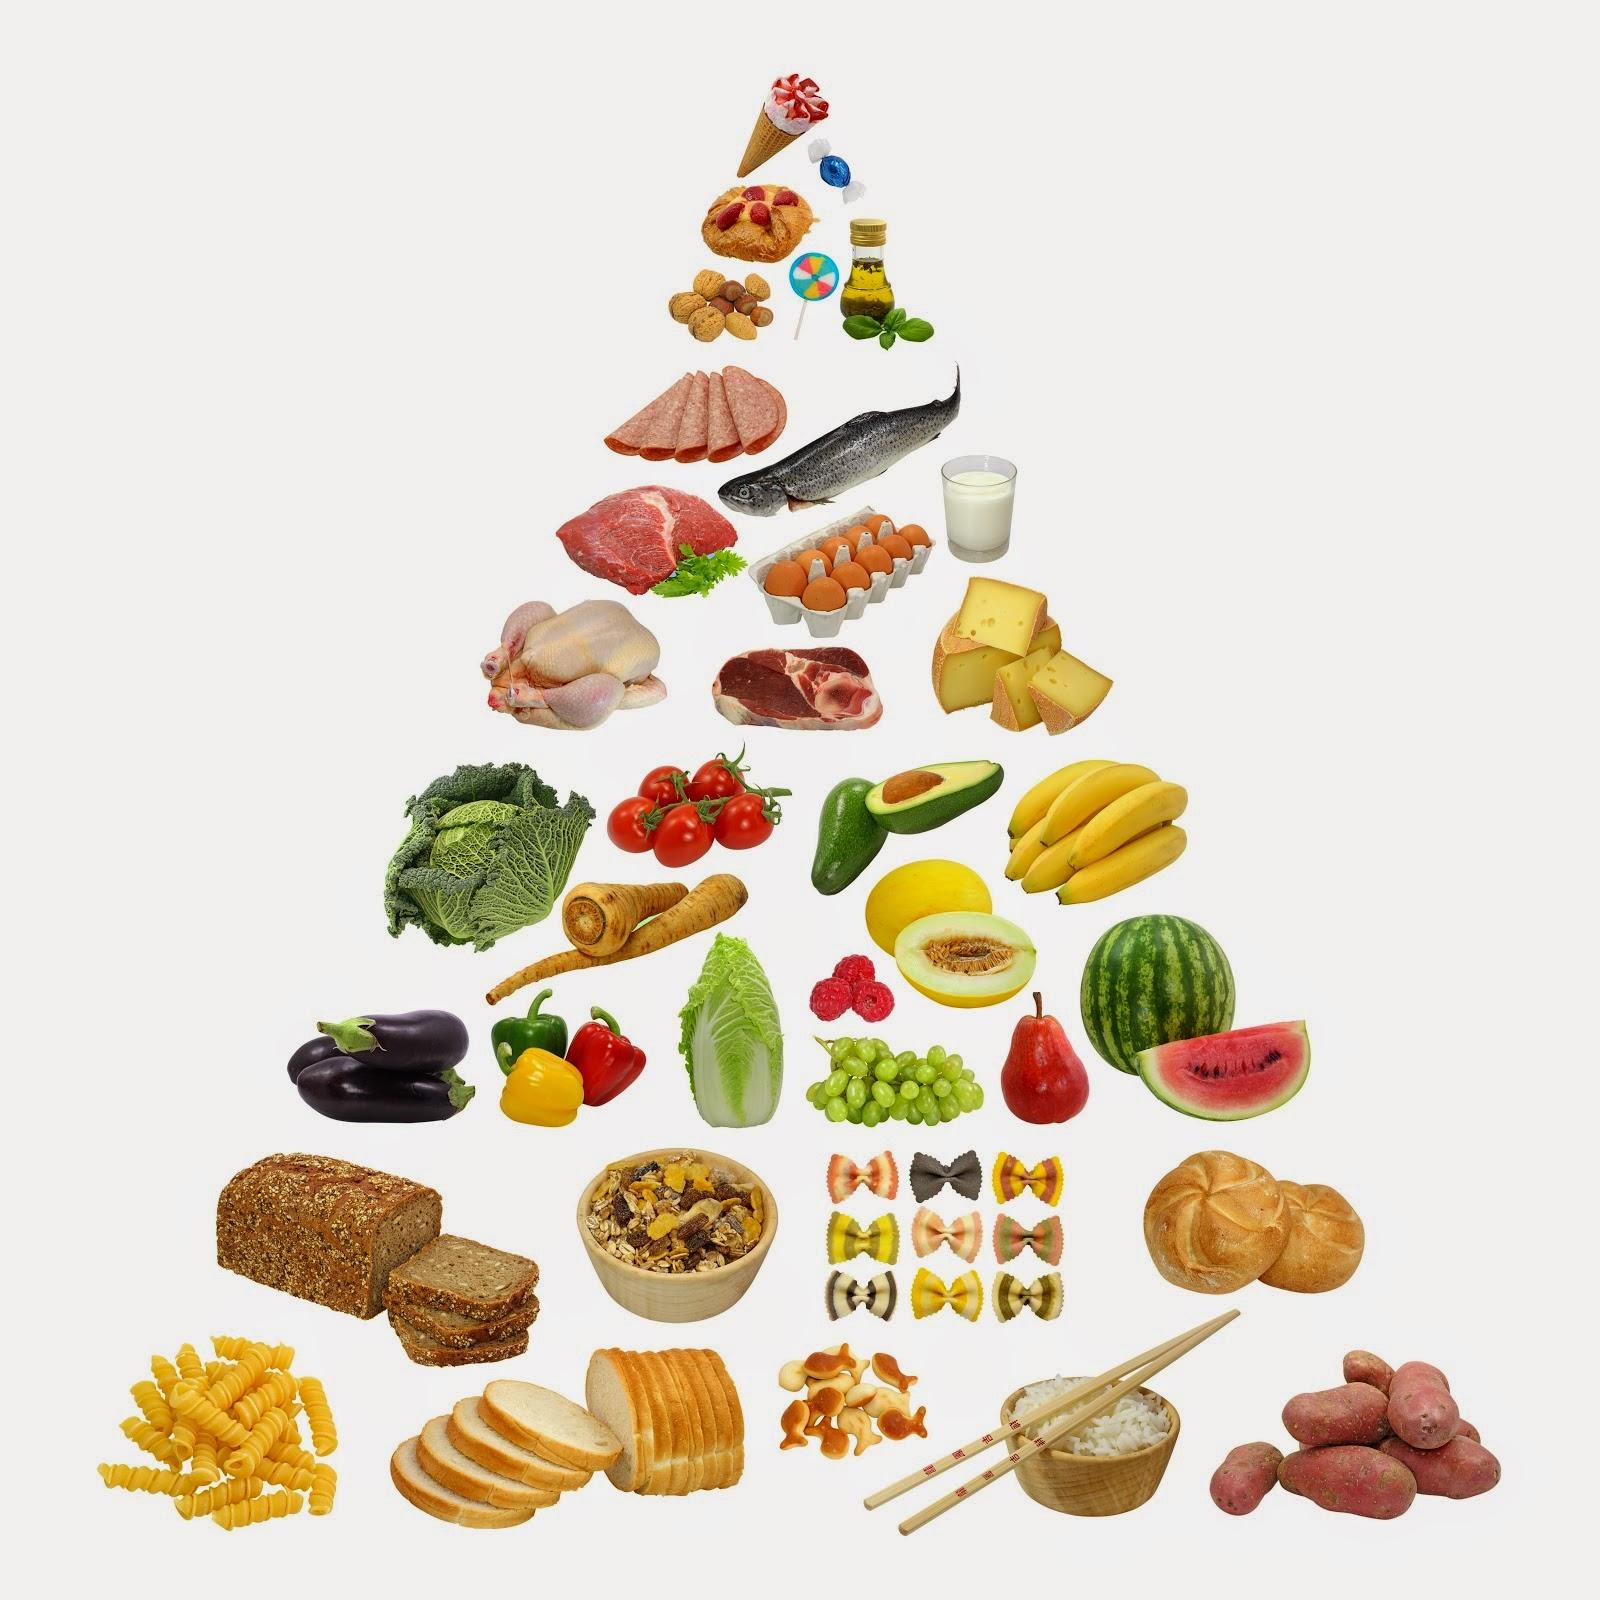 Protein,+carbs,+fat